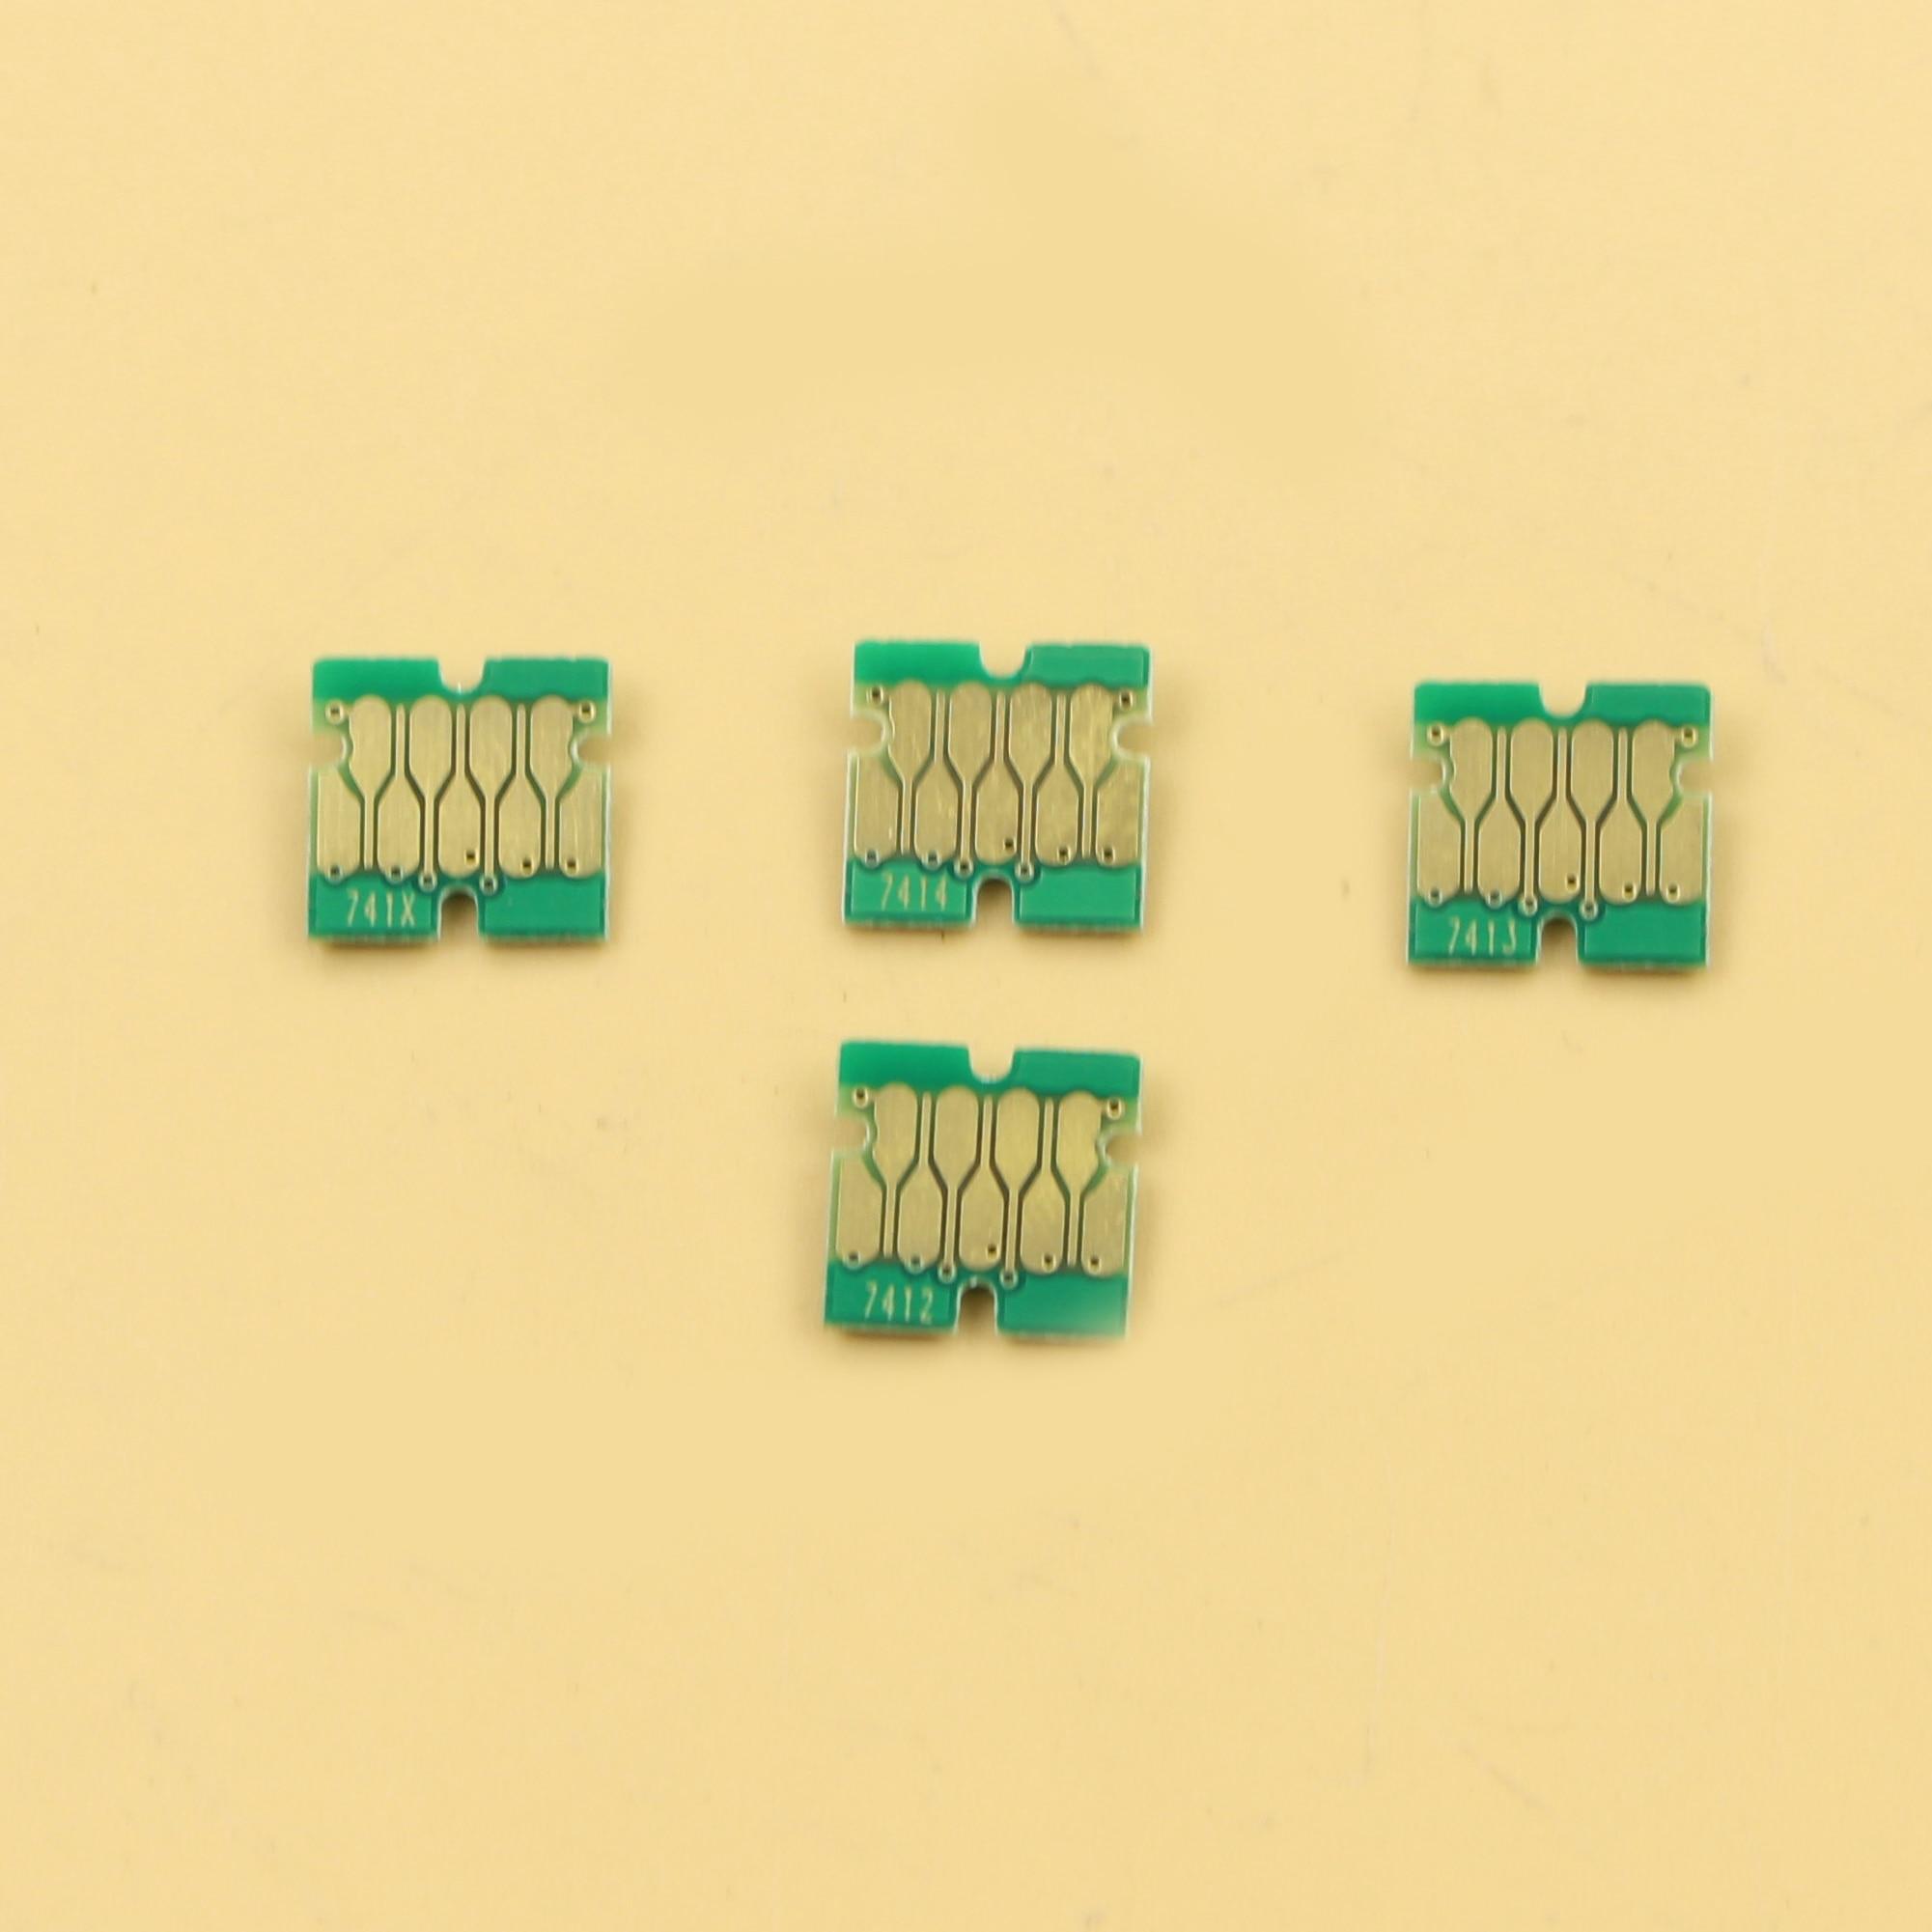 5 sets F6200 F9200 F7200 chips de cartuchos de tinta para Epson F9200 F6270 F7270 F9270 F9370 chips HDK T741X/T7412/T7413/T7414 1000ML